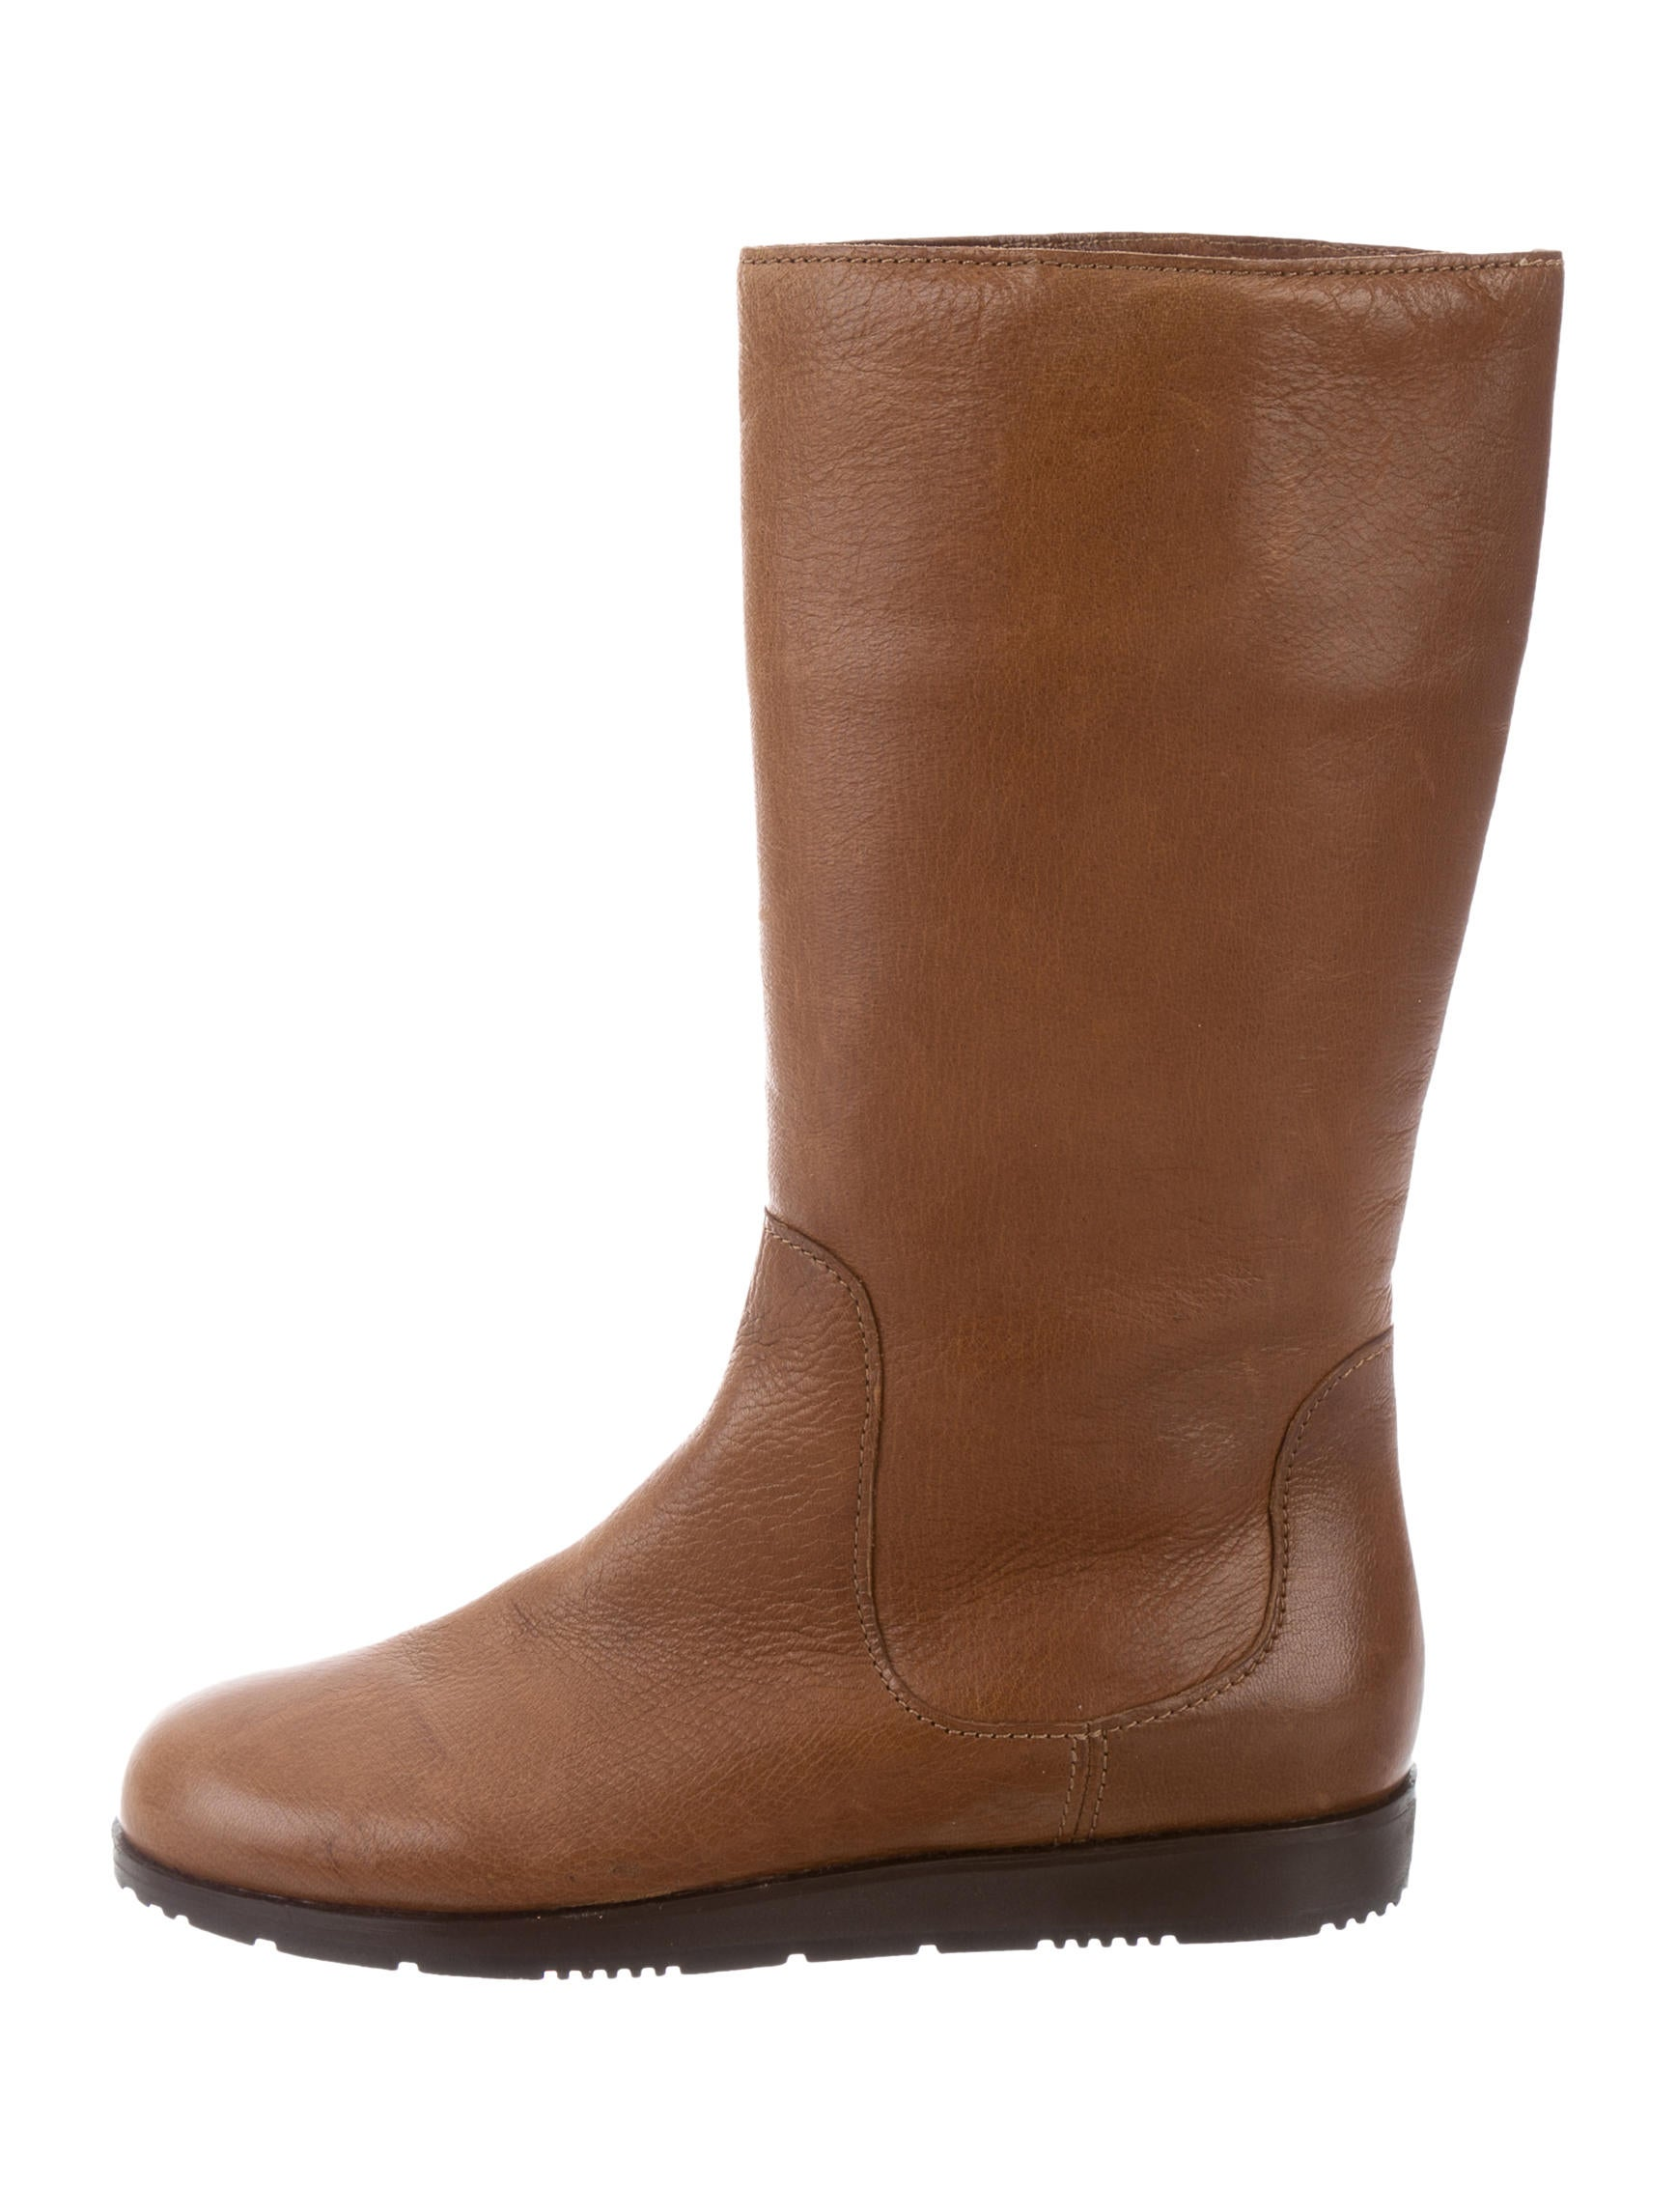 prada sport leather mid calf boots shoes wpr42790